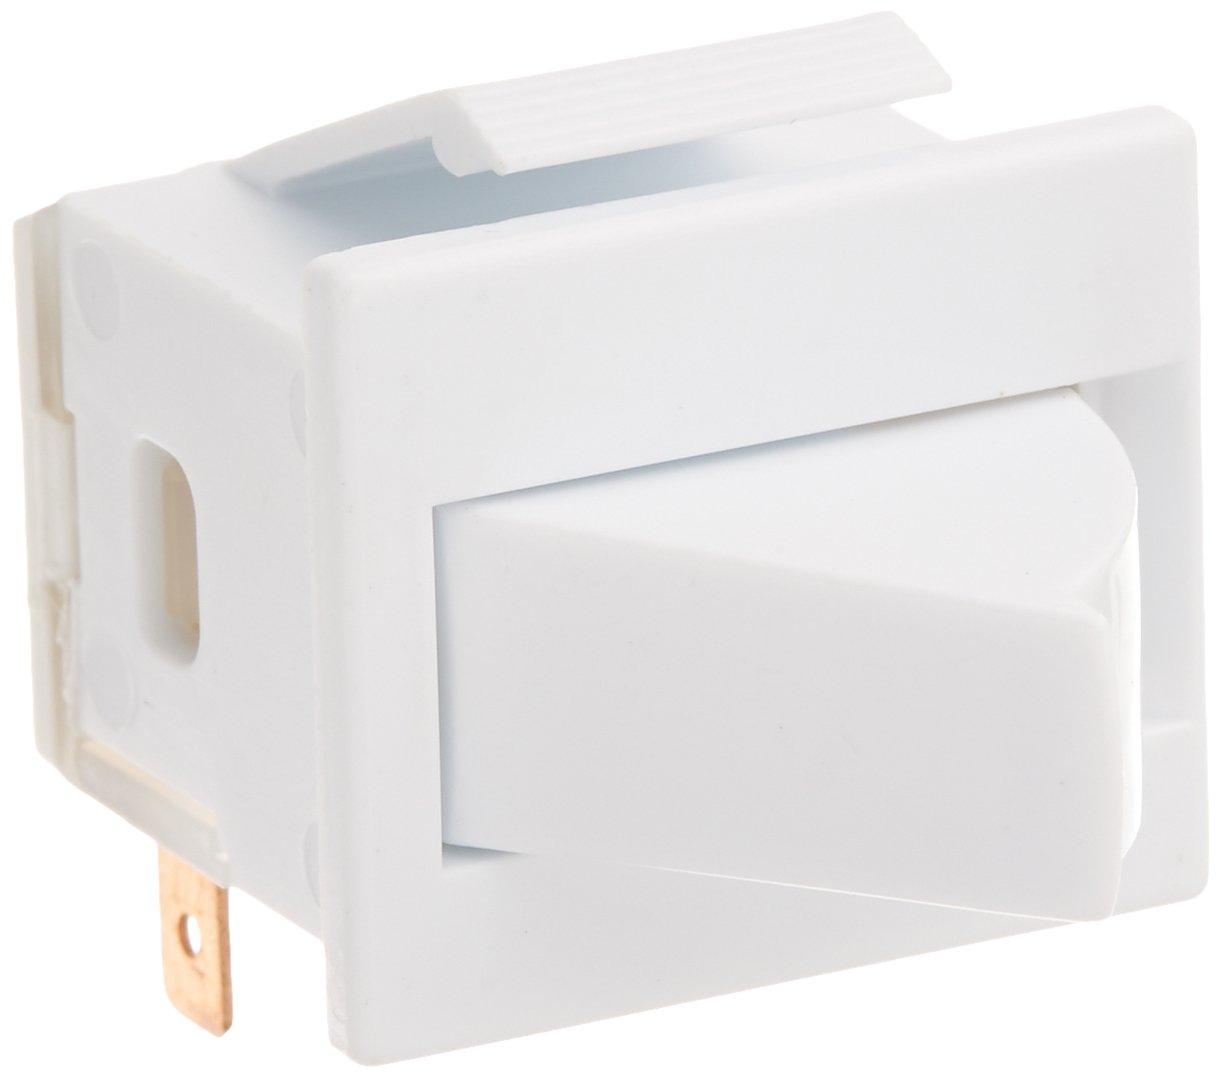 Refrigerator Door Light Switch for Whirlpool, Maytag, Admiral, Amana, Crosley, Jenn-Air, Kenmore, KitchenAid, Magic Chef New NON-OEM